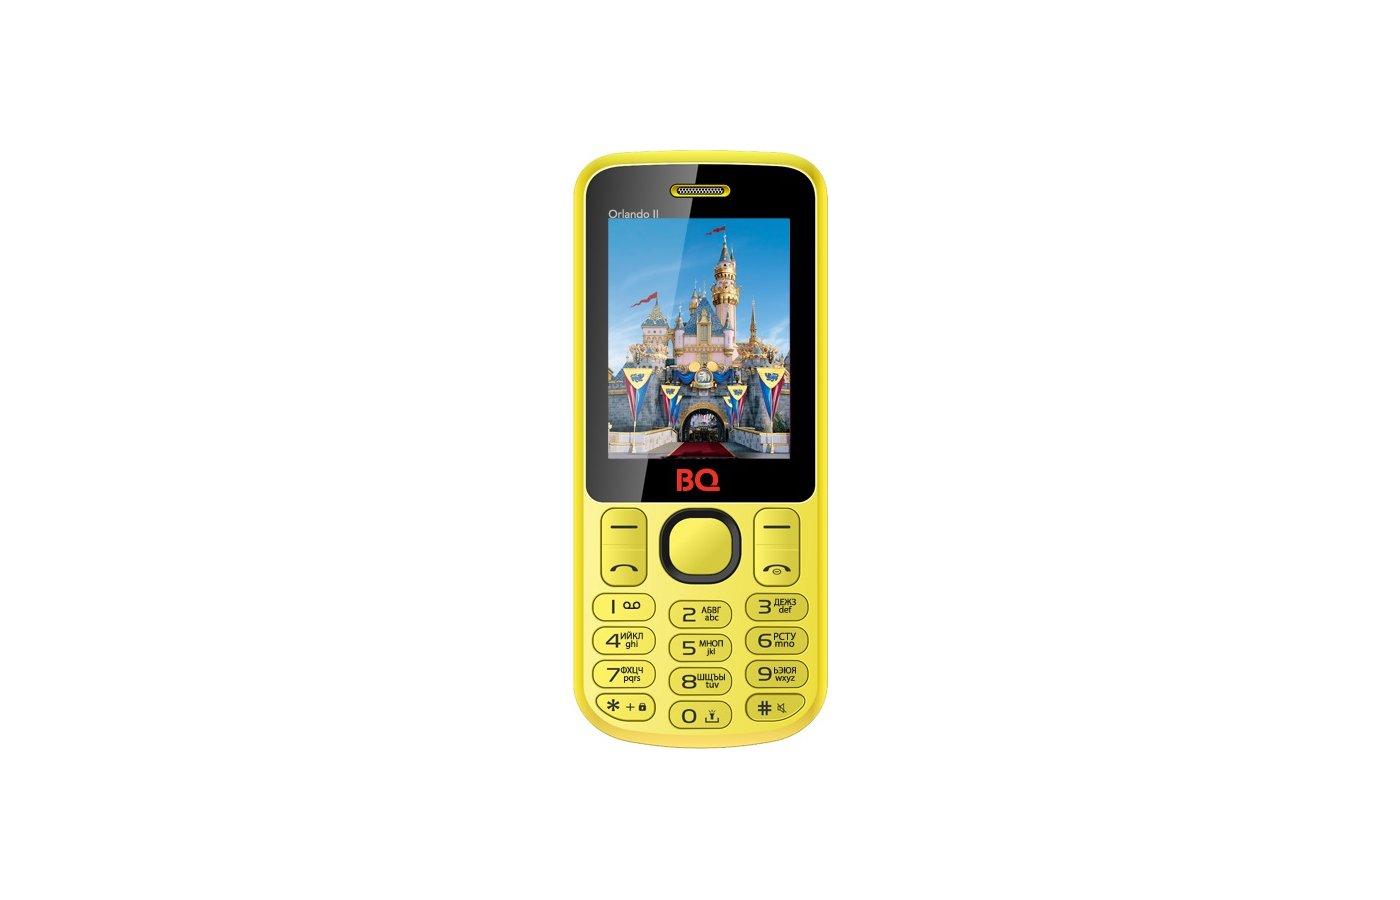 Мобильный телефон BQ BQM-2403 Orlando II Yellow